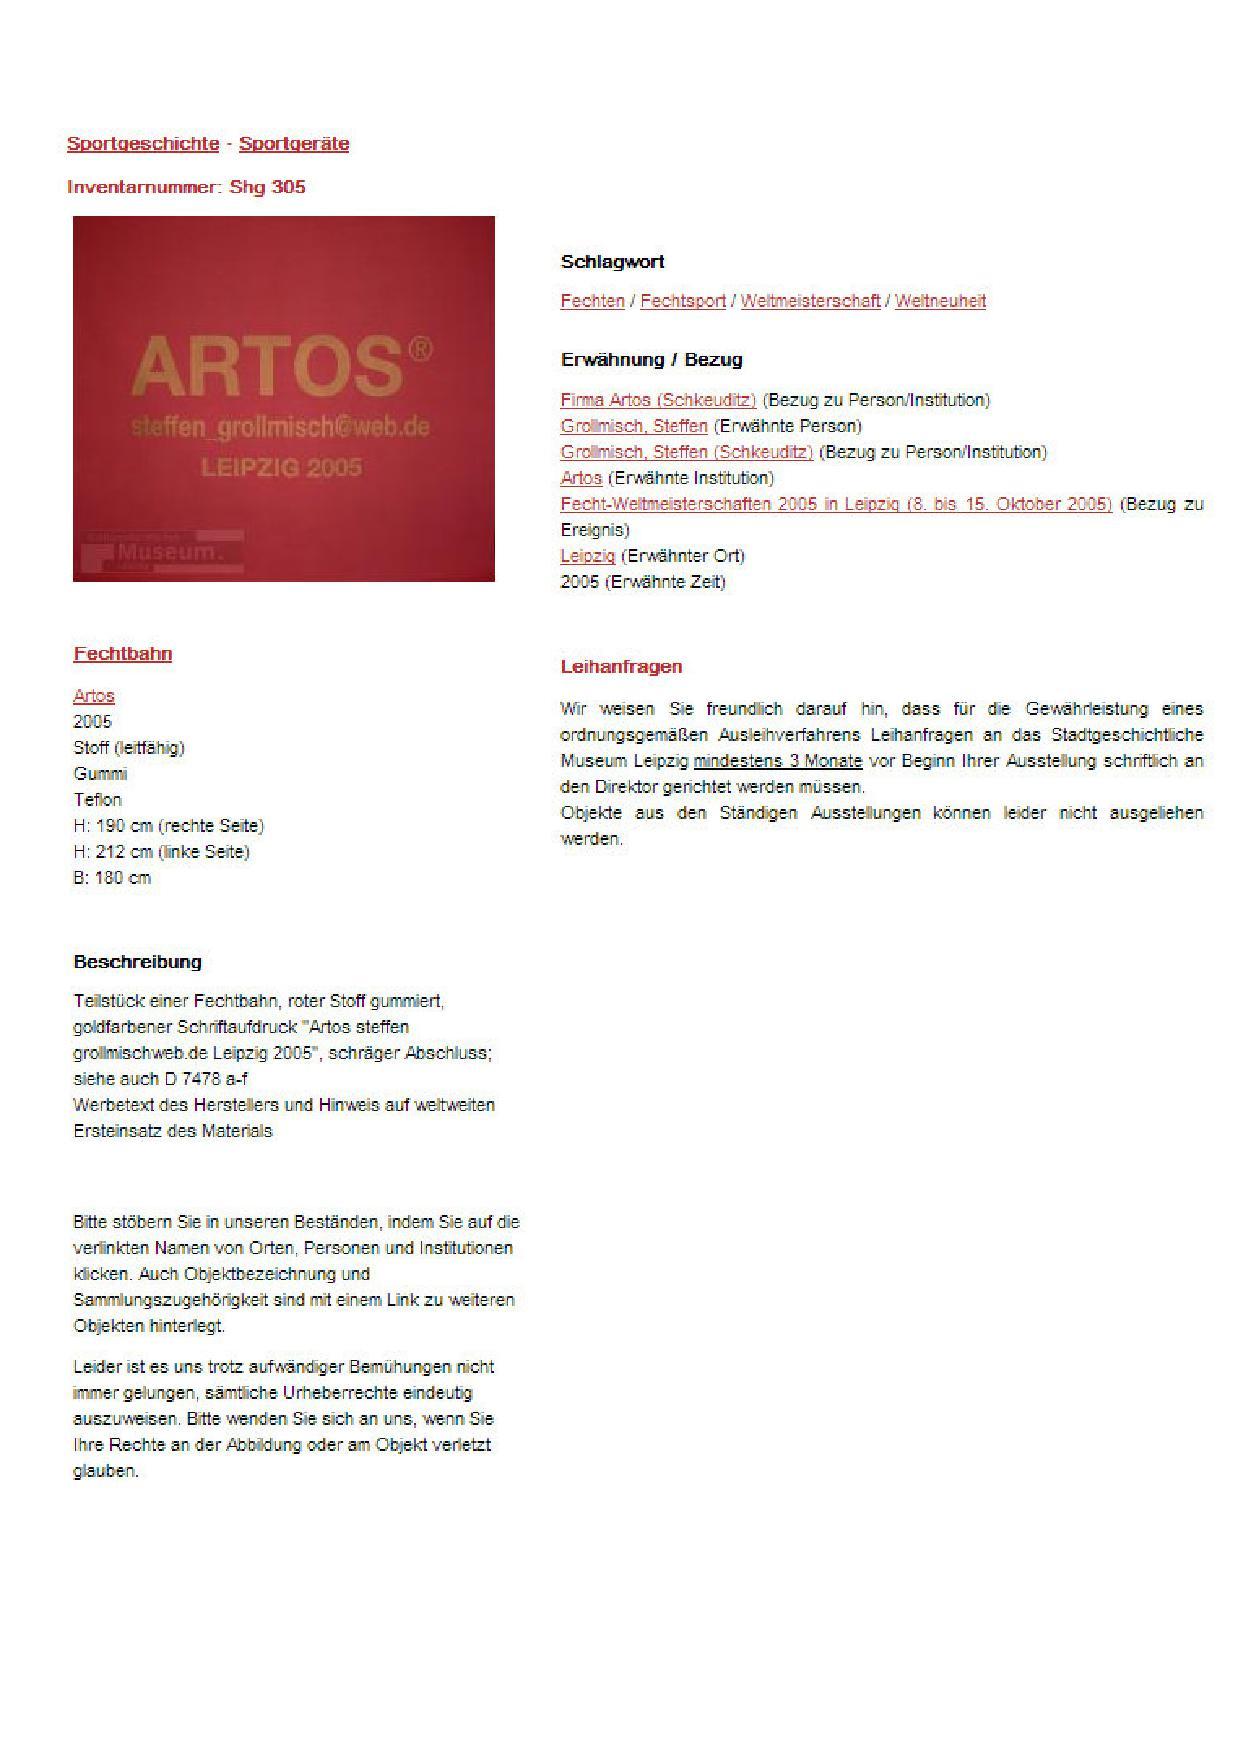 ARTOS 2006 - ARTOS Fencing Piste SCHREIBT GESCHICHTE